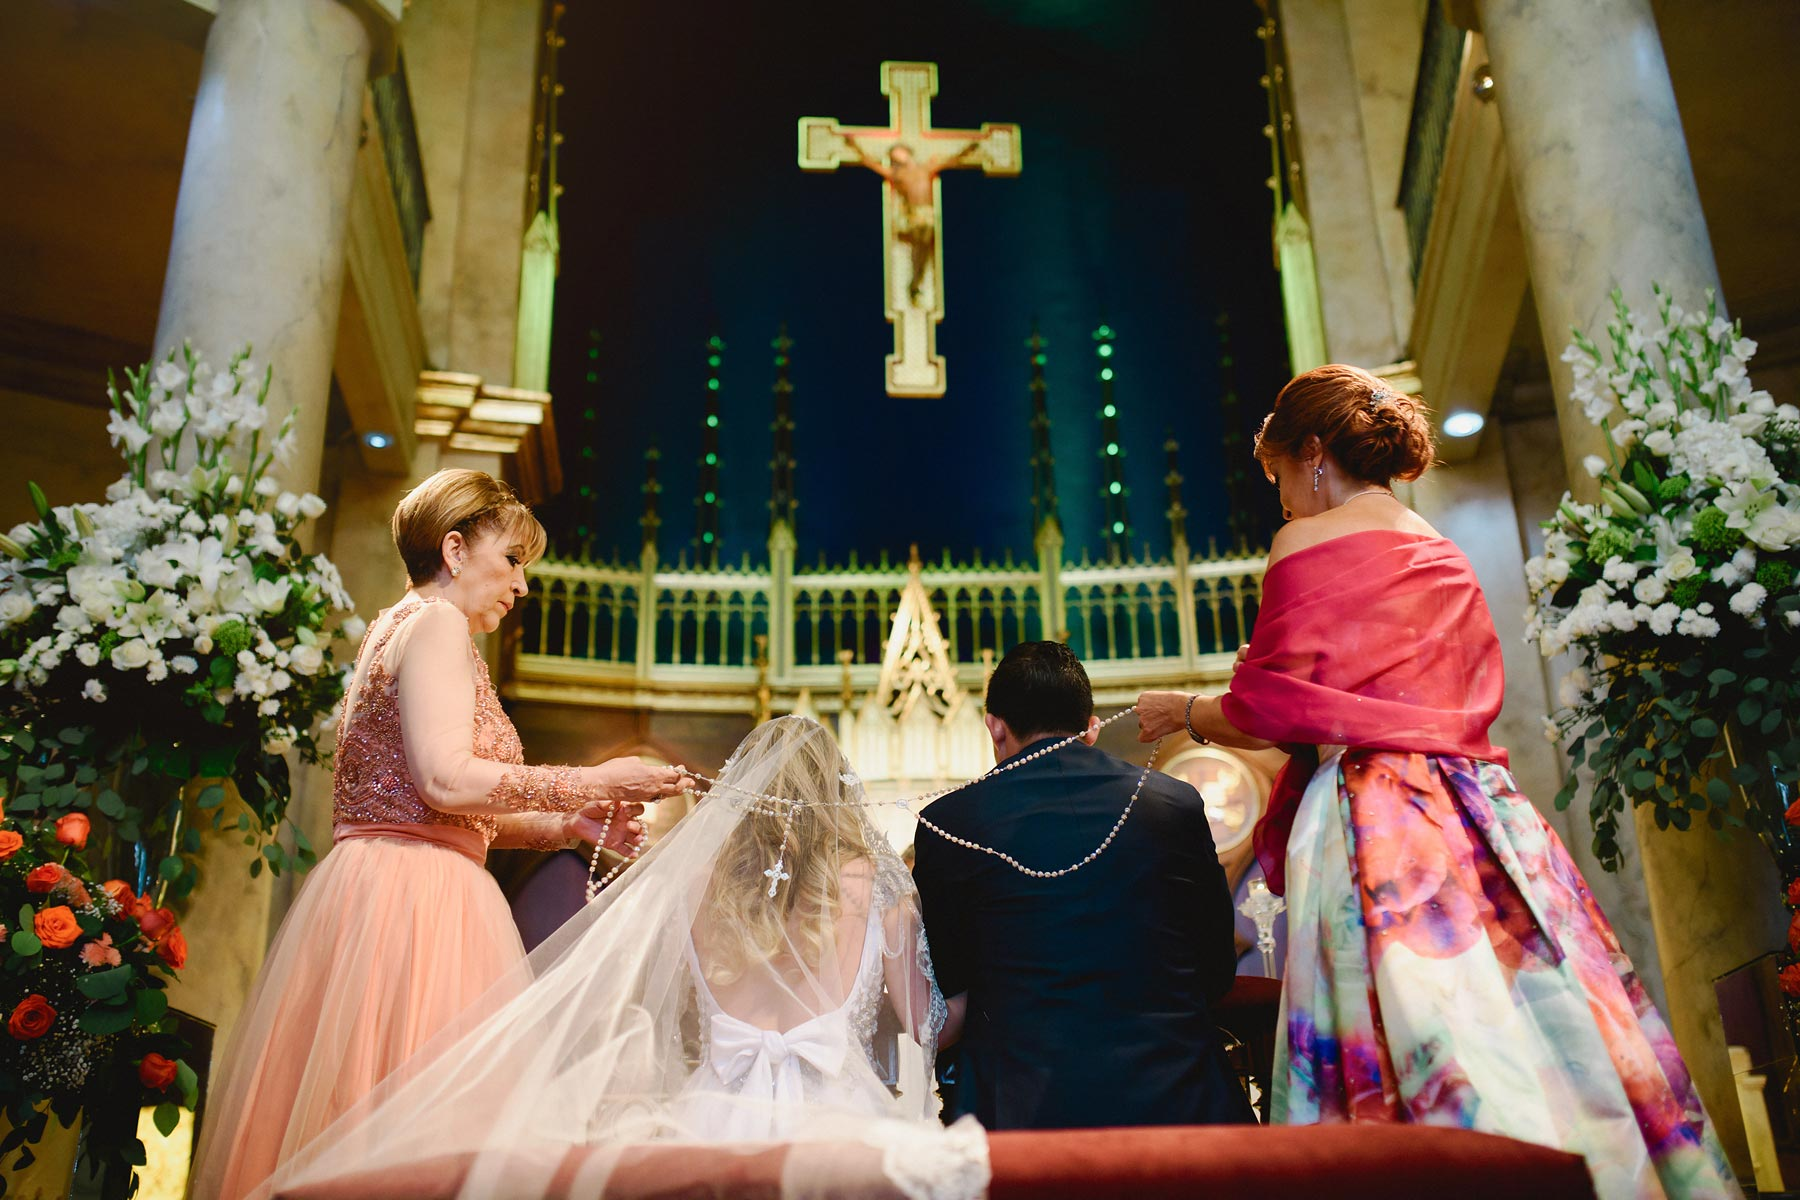 fotografo-de-bodas-en-monterrey-12